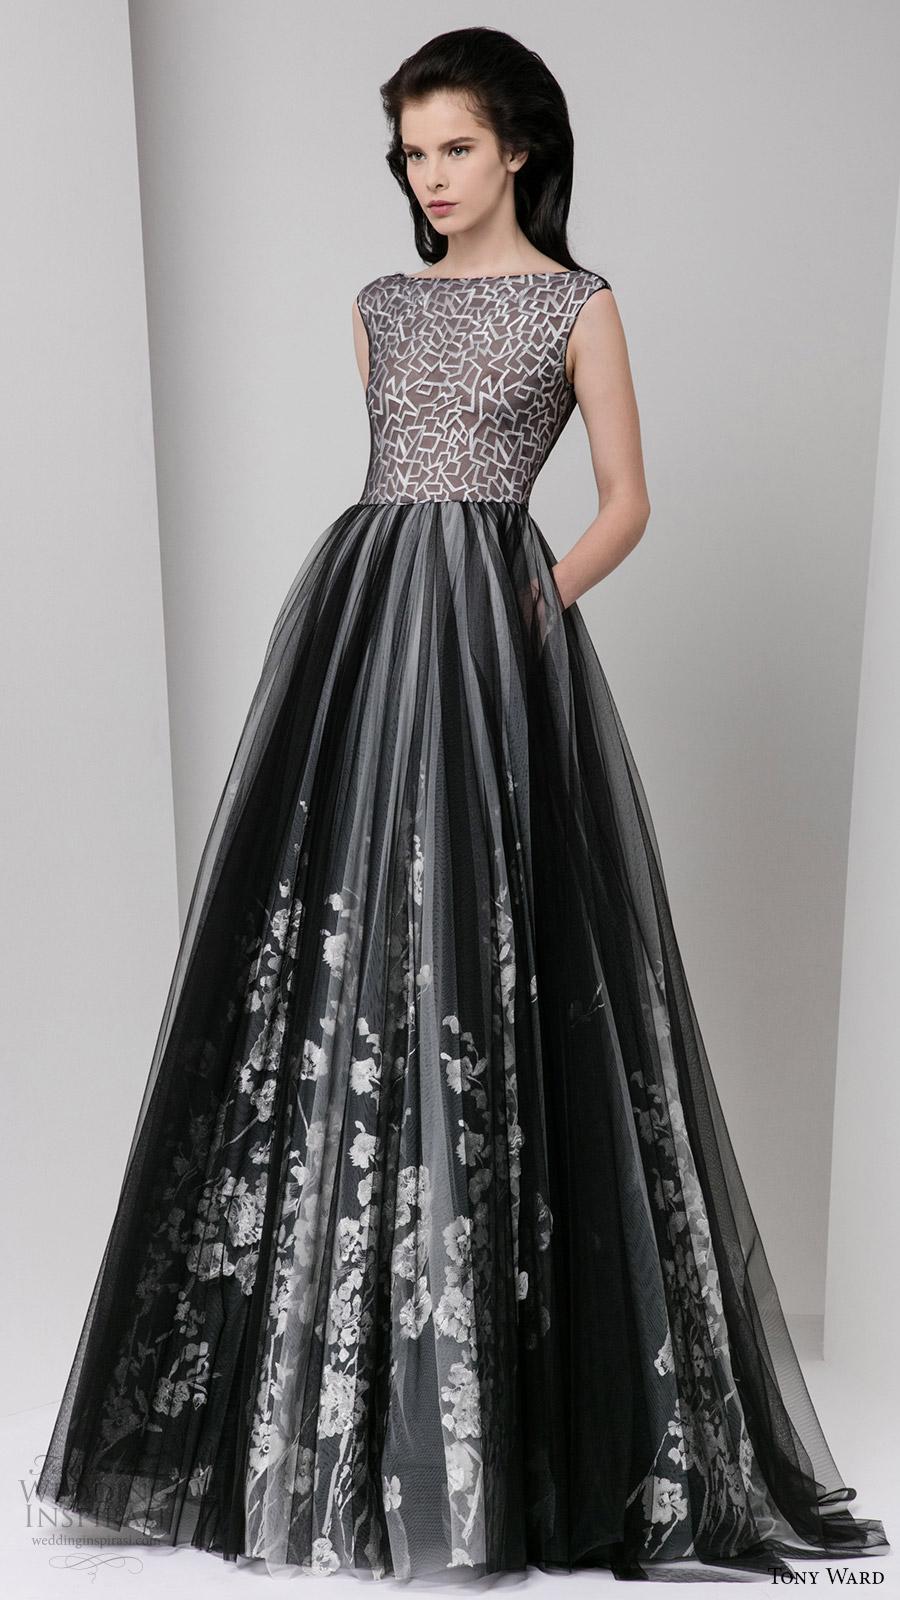 tony ward fall 2016 rtw cap sleeves illusion bateau neck bodice ball gown skirt pockets evening dress black